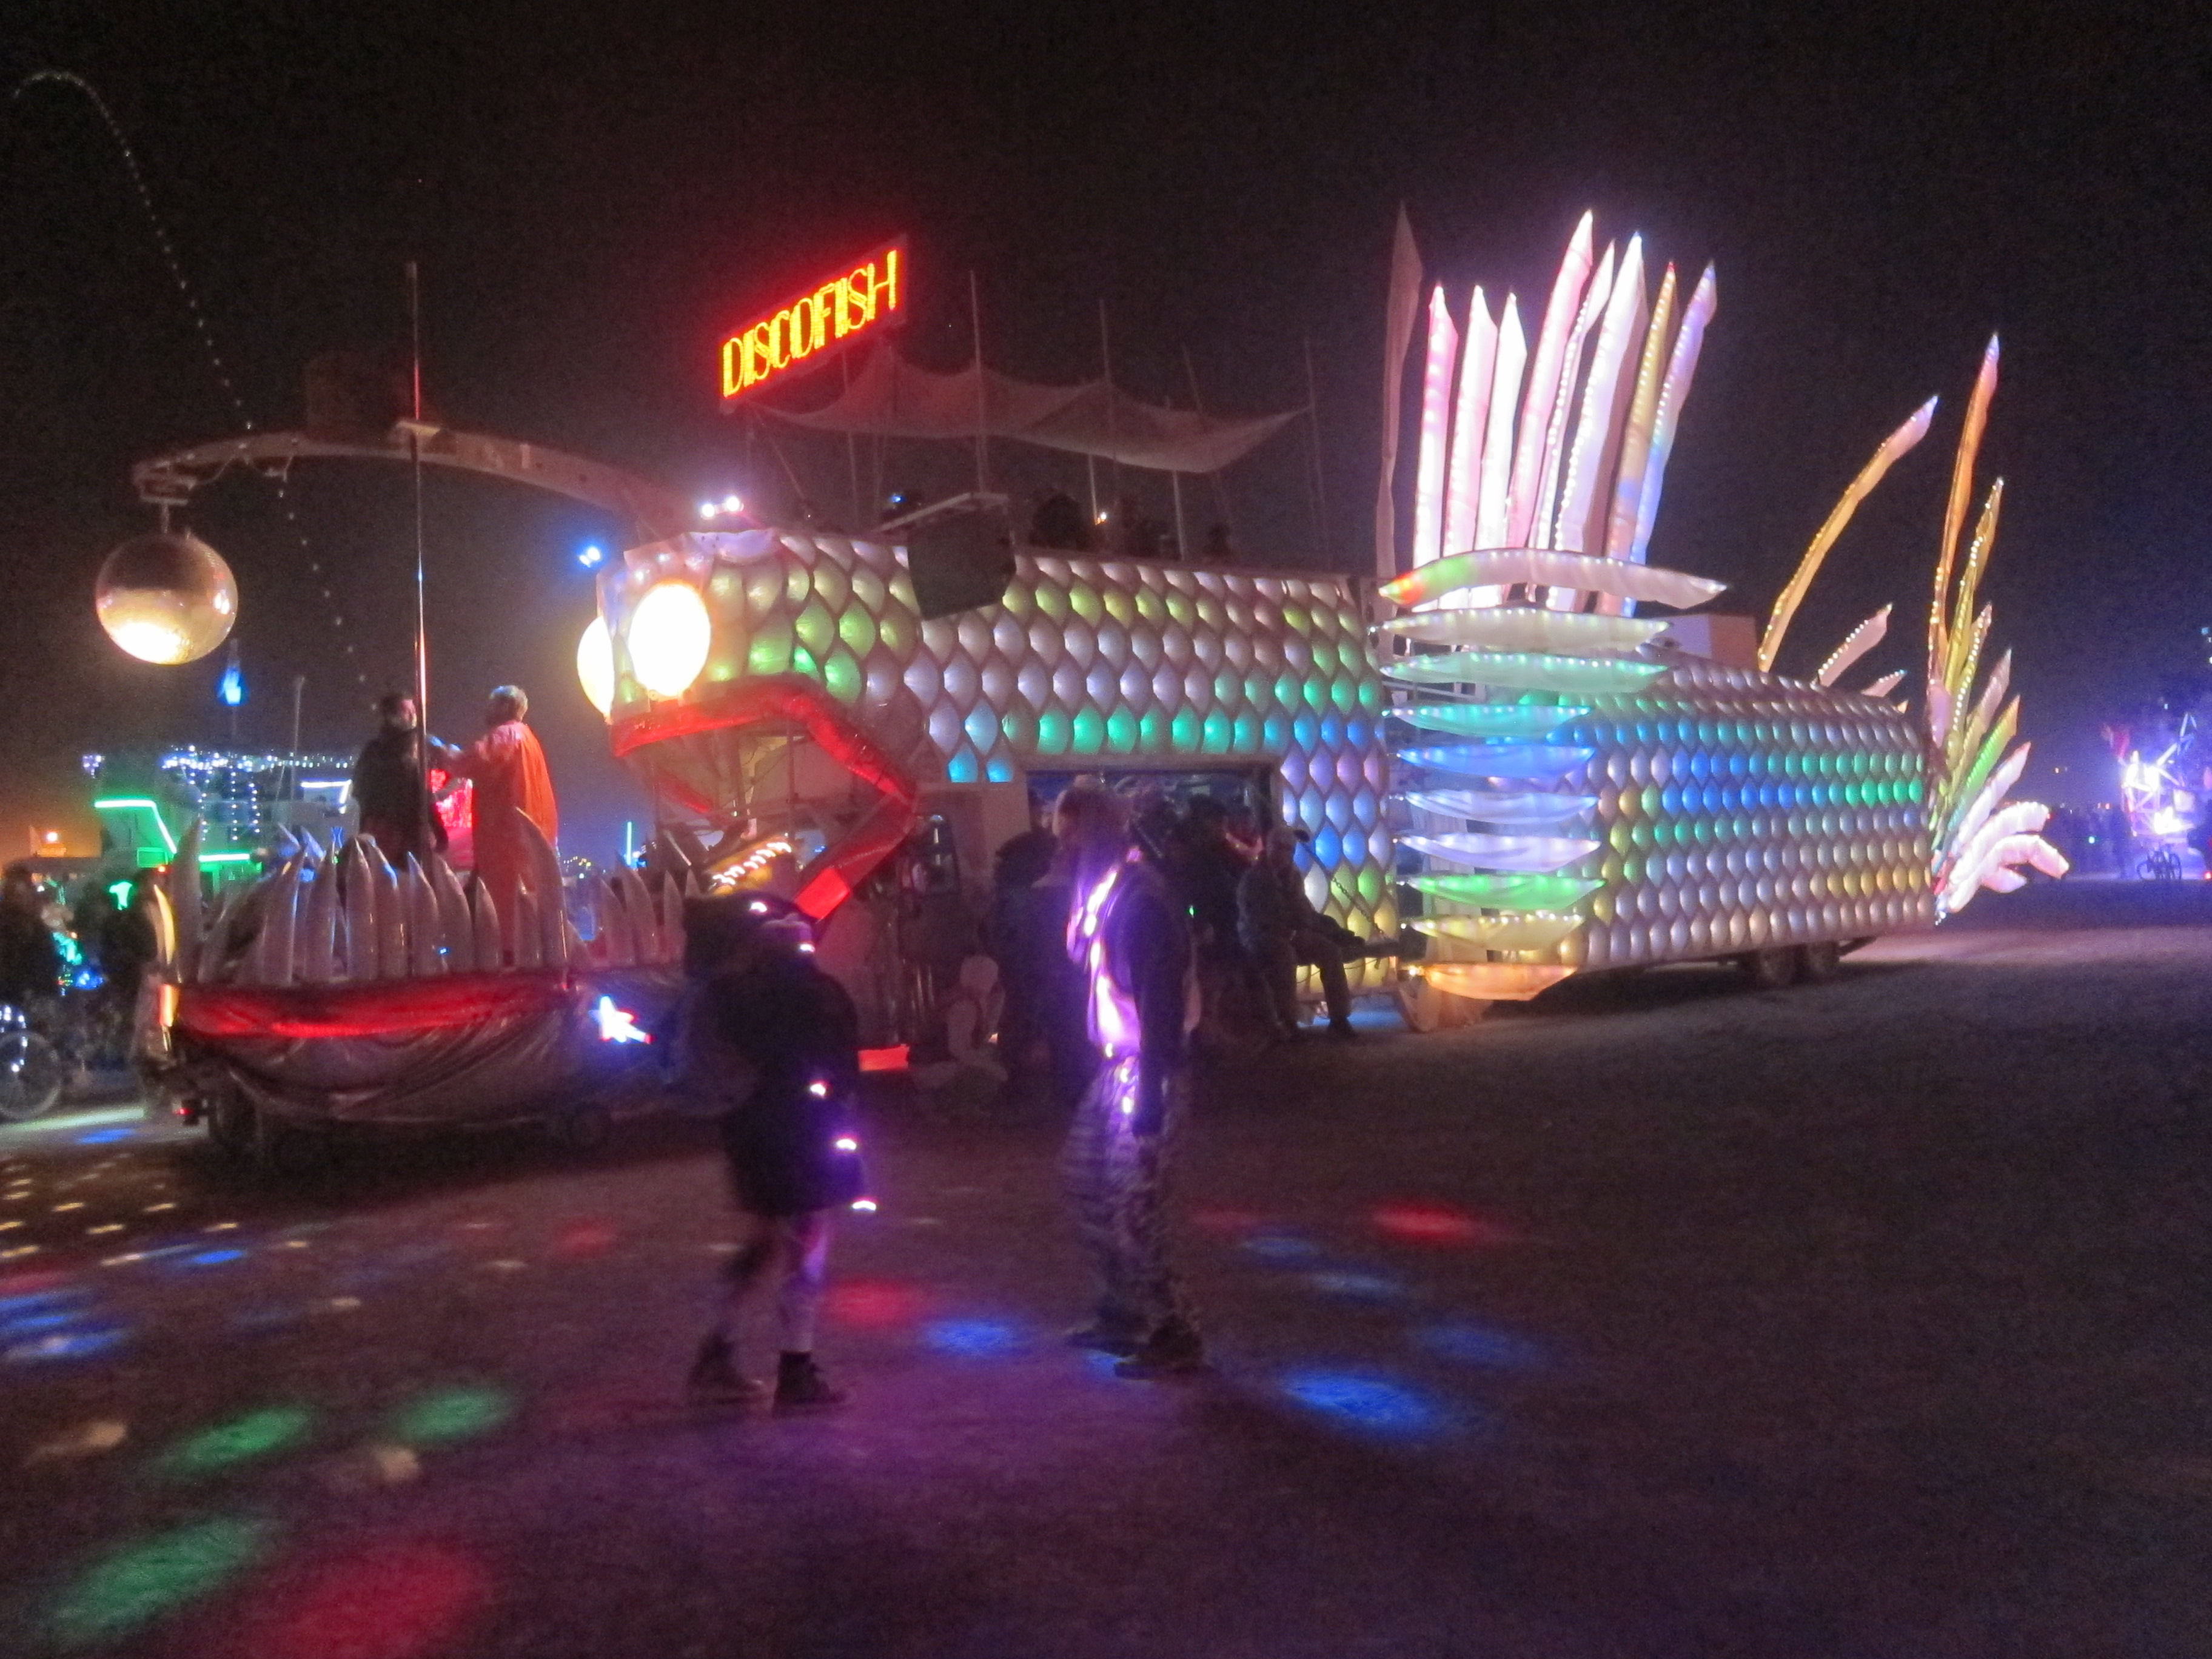 DiscoFish art car